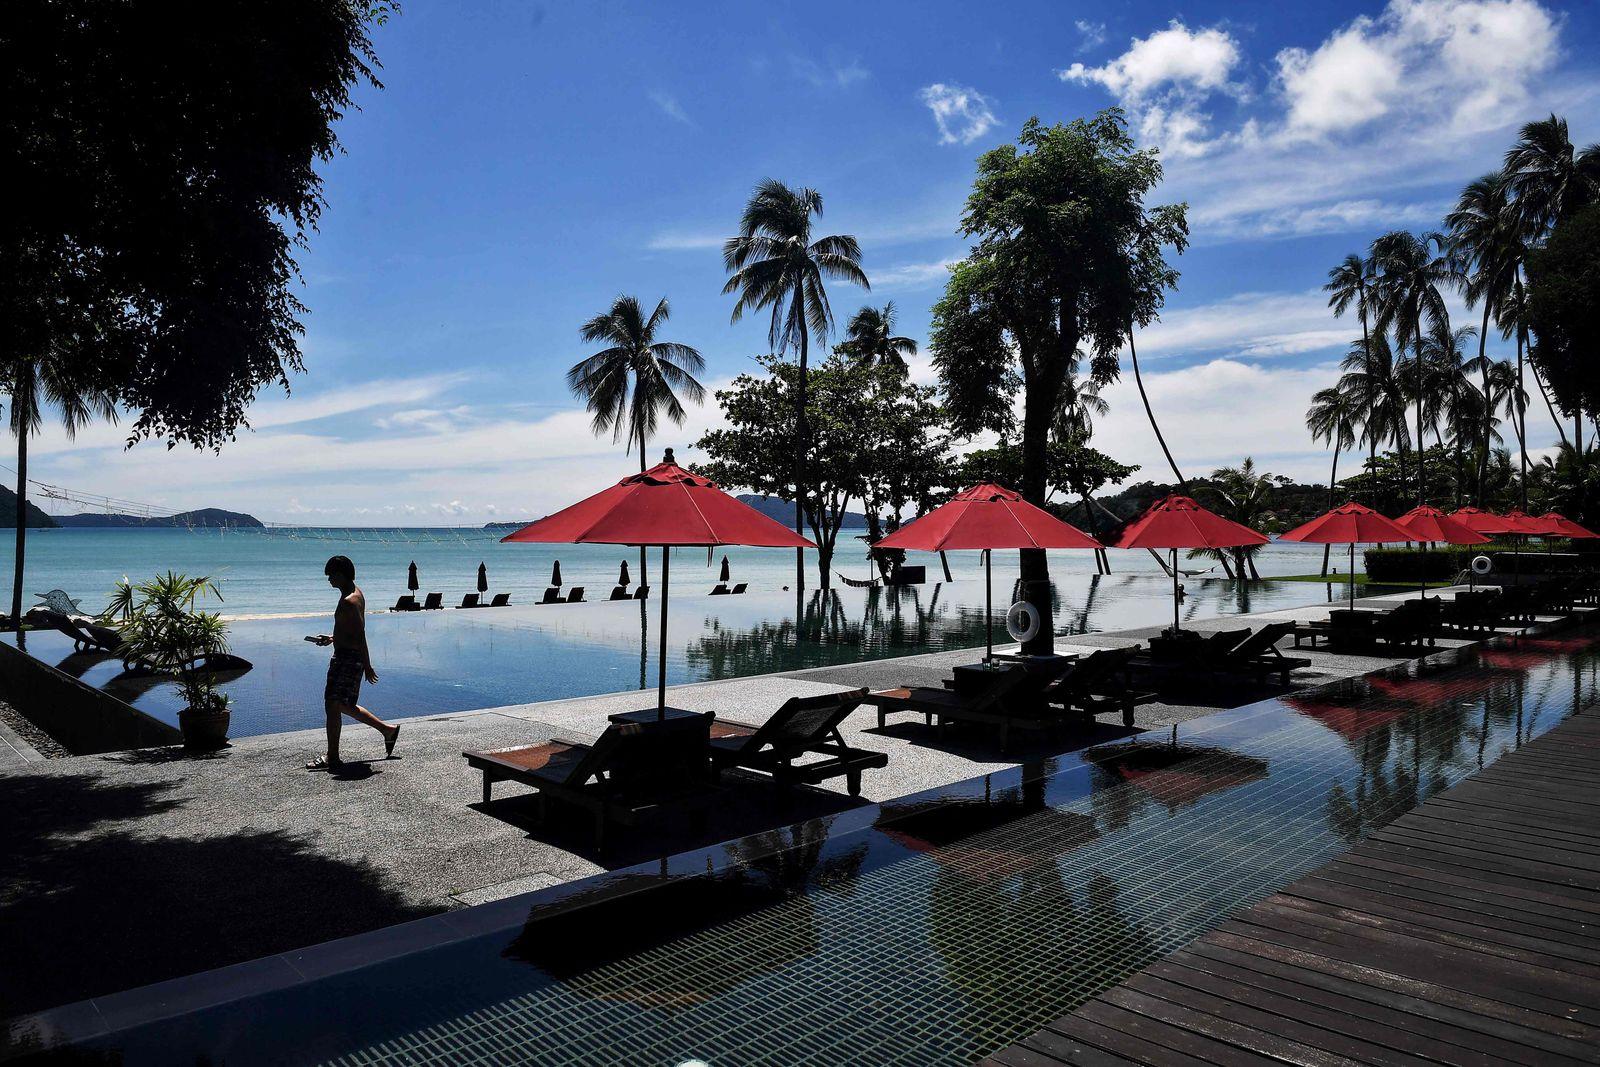 FILES-THAILAND-HEALTH-VIRUS-TOURISM